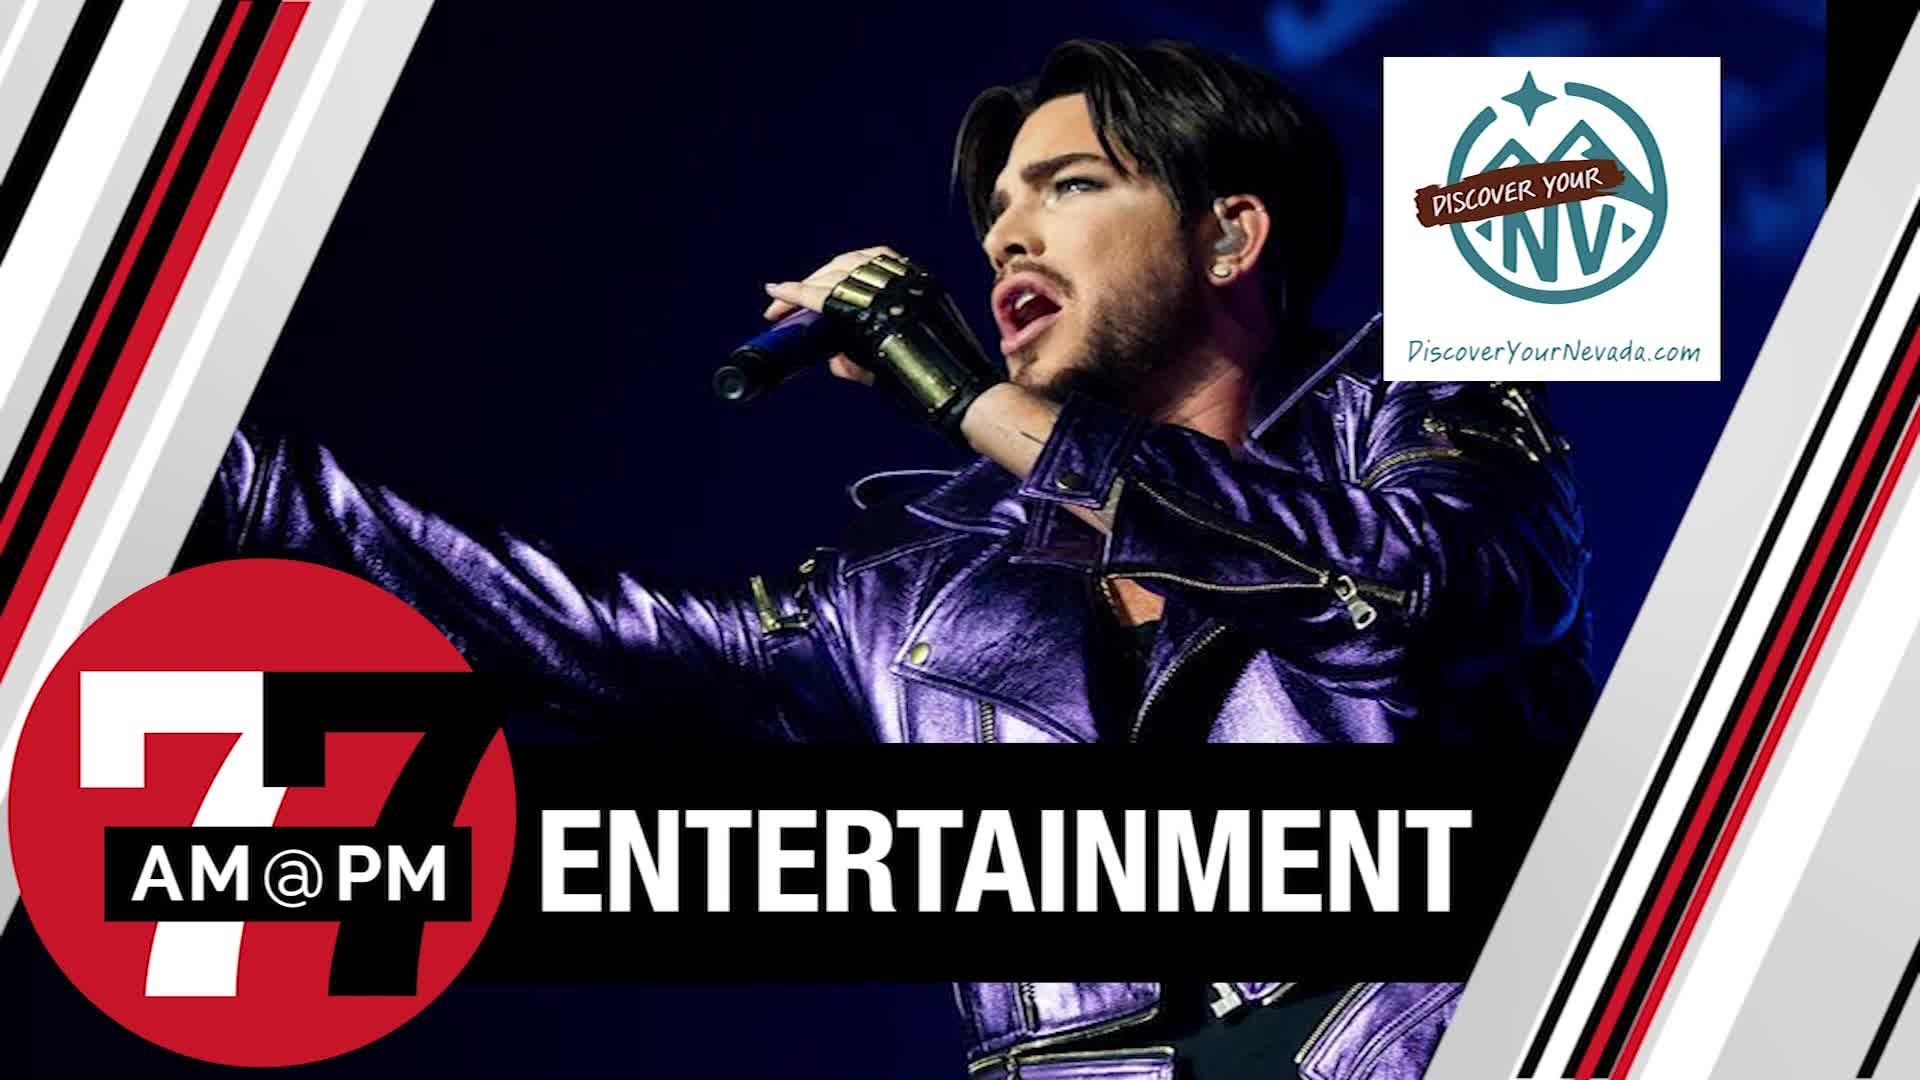 7@7PM Adam Lambert Returns to Las Vegas